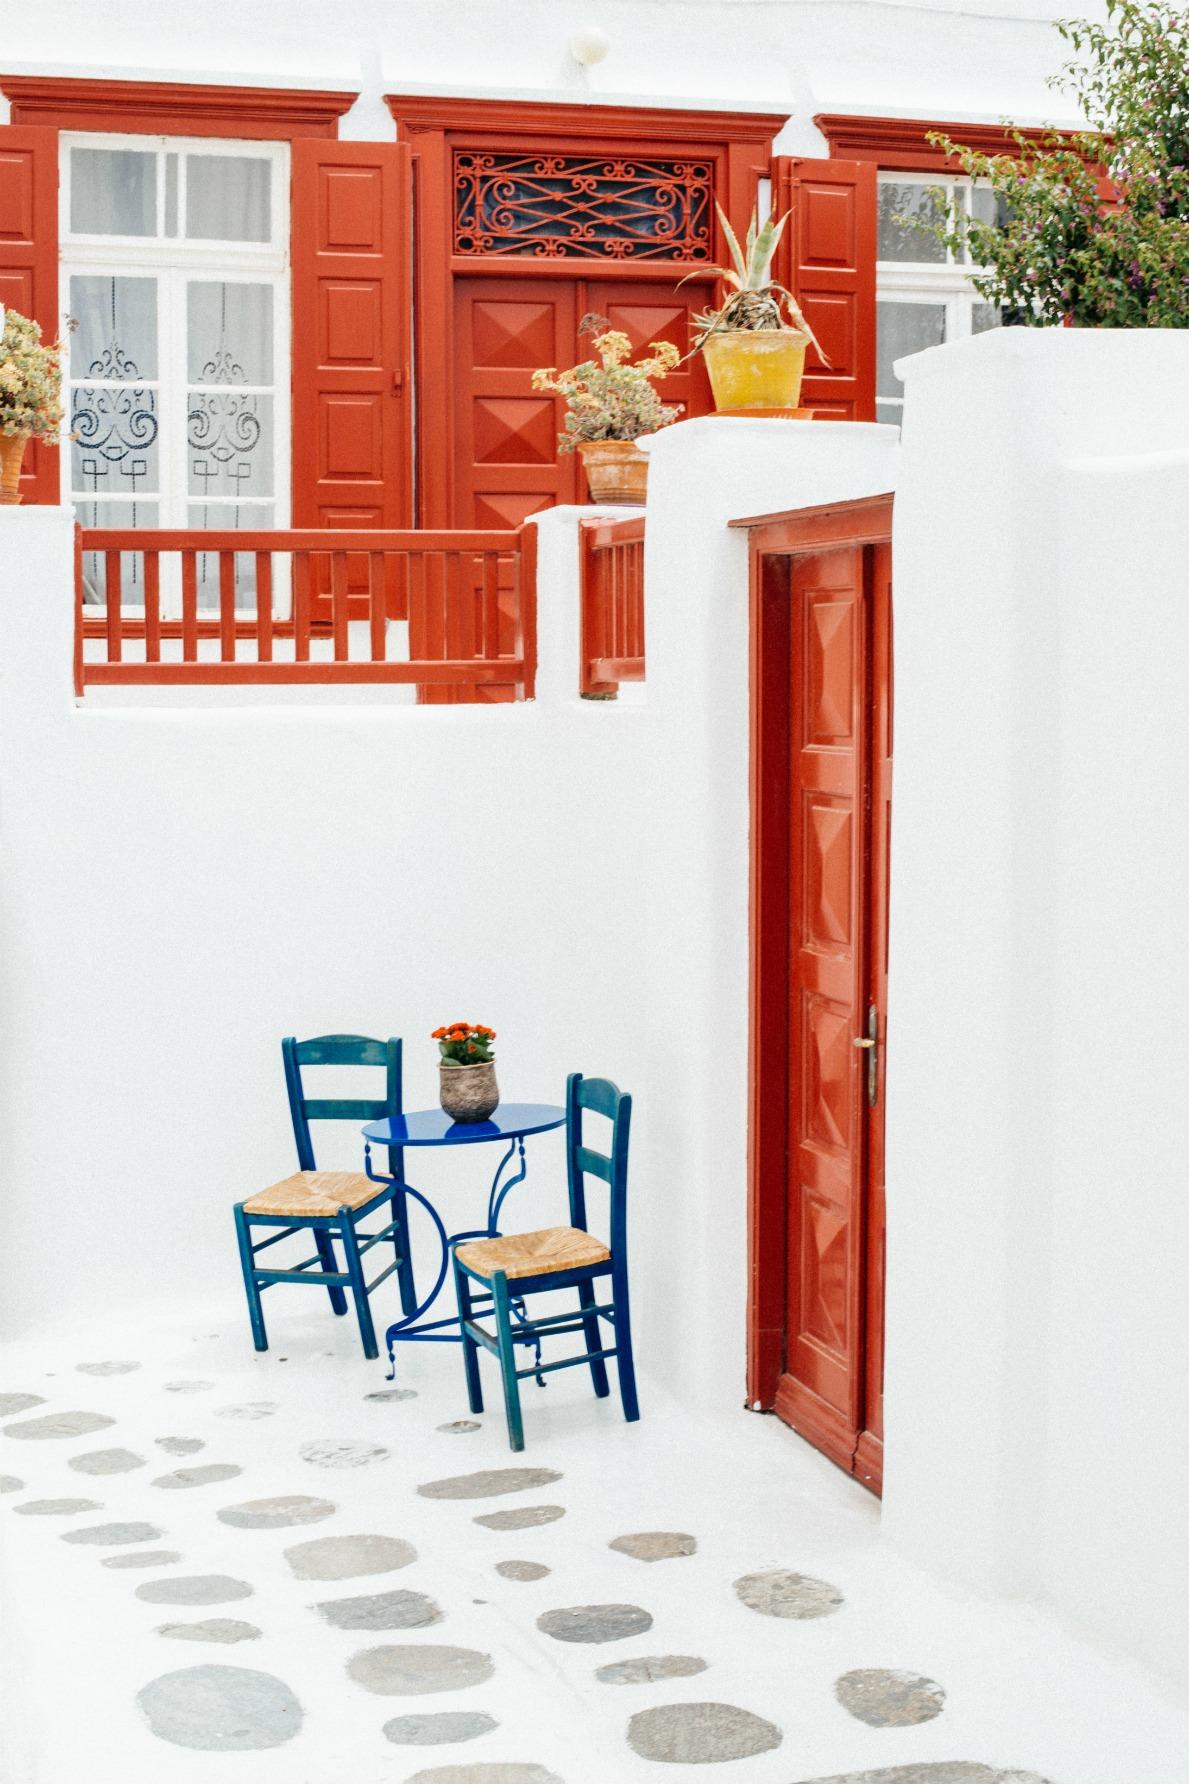 wind-mills-mykonos-town-2016-holidays-vacay-disi-couture-lemon-print-dress-31